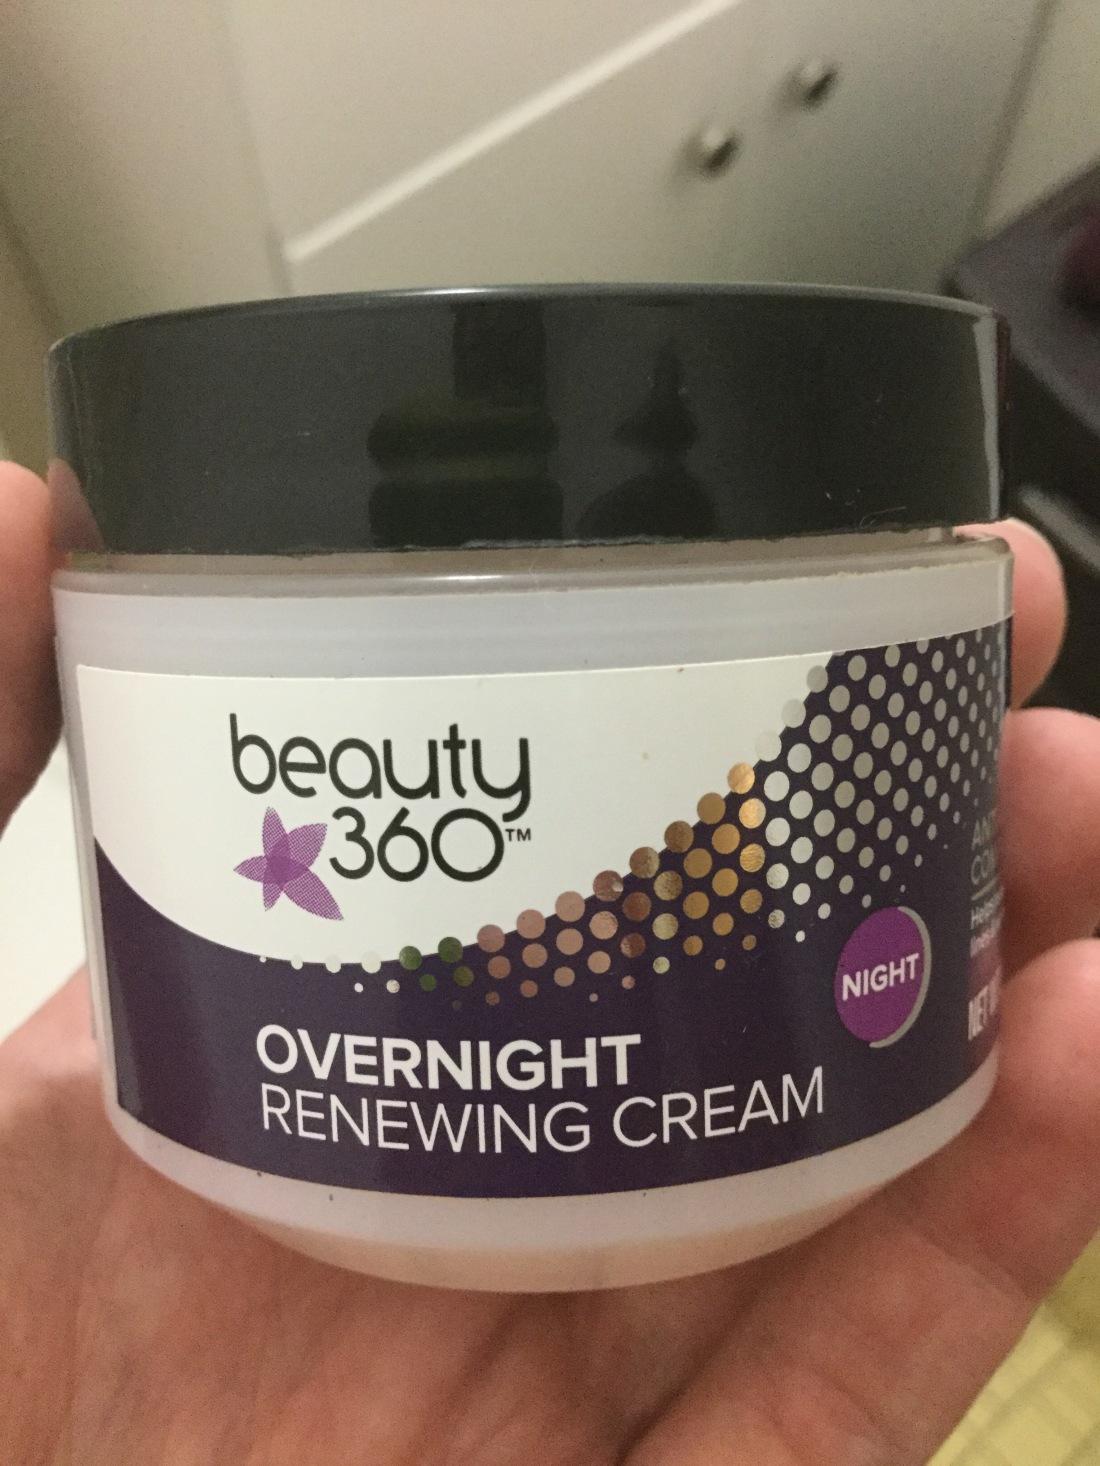 Overnight firming cream